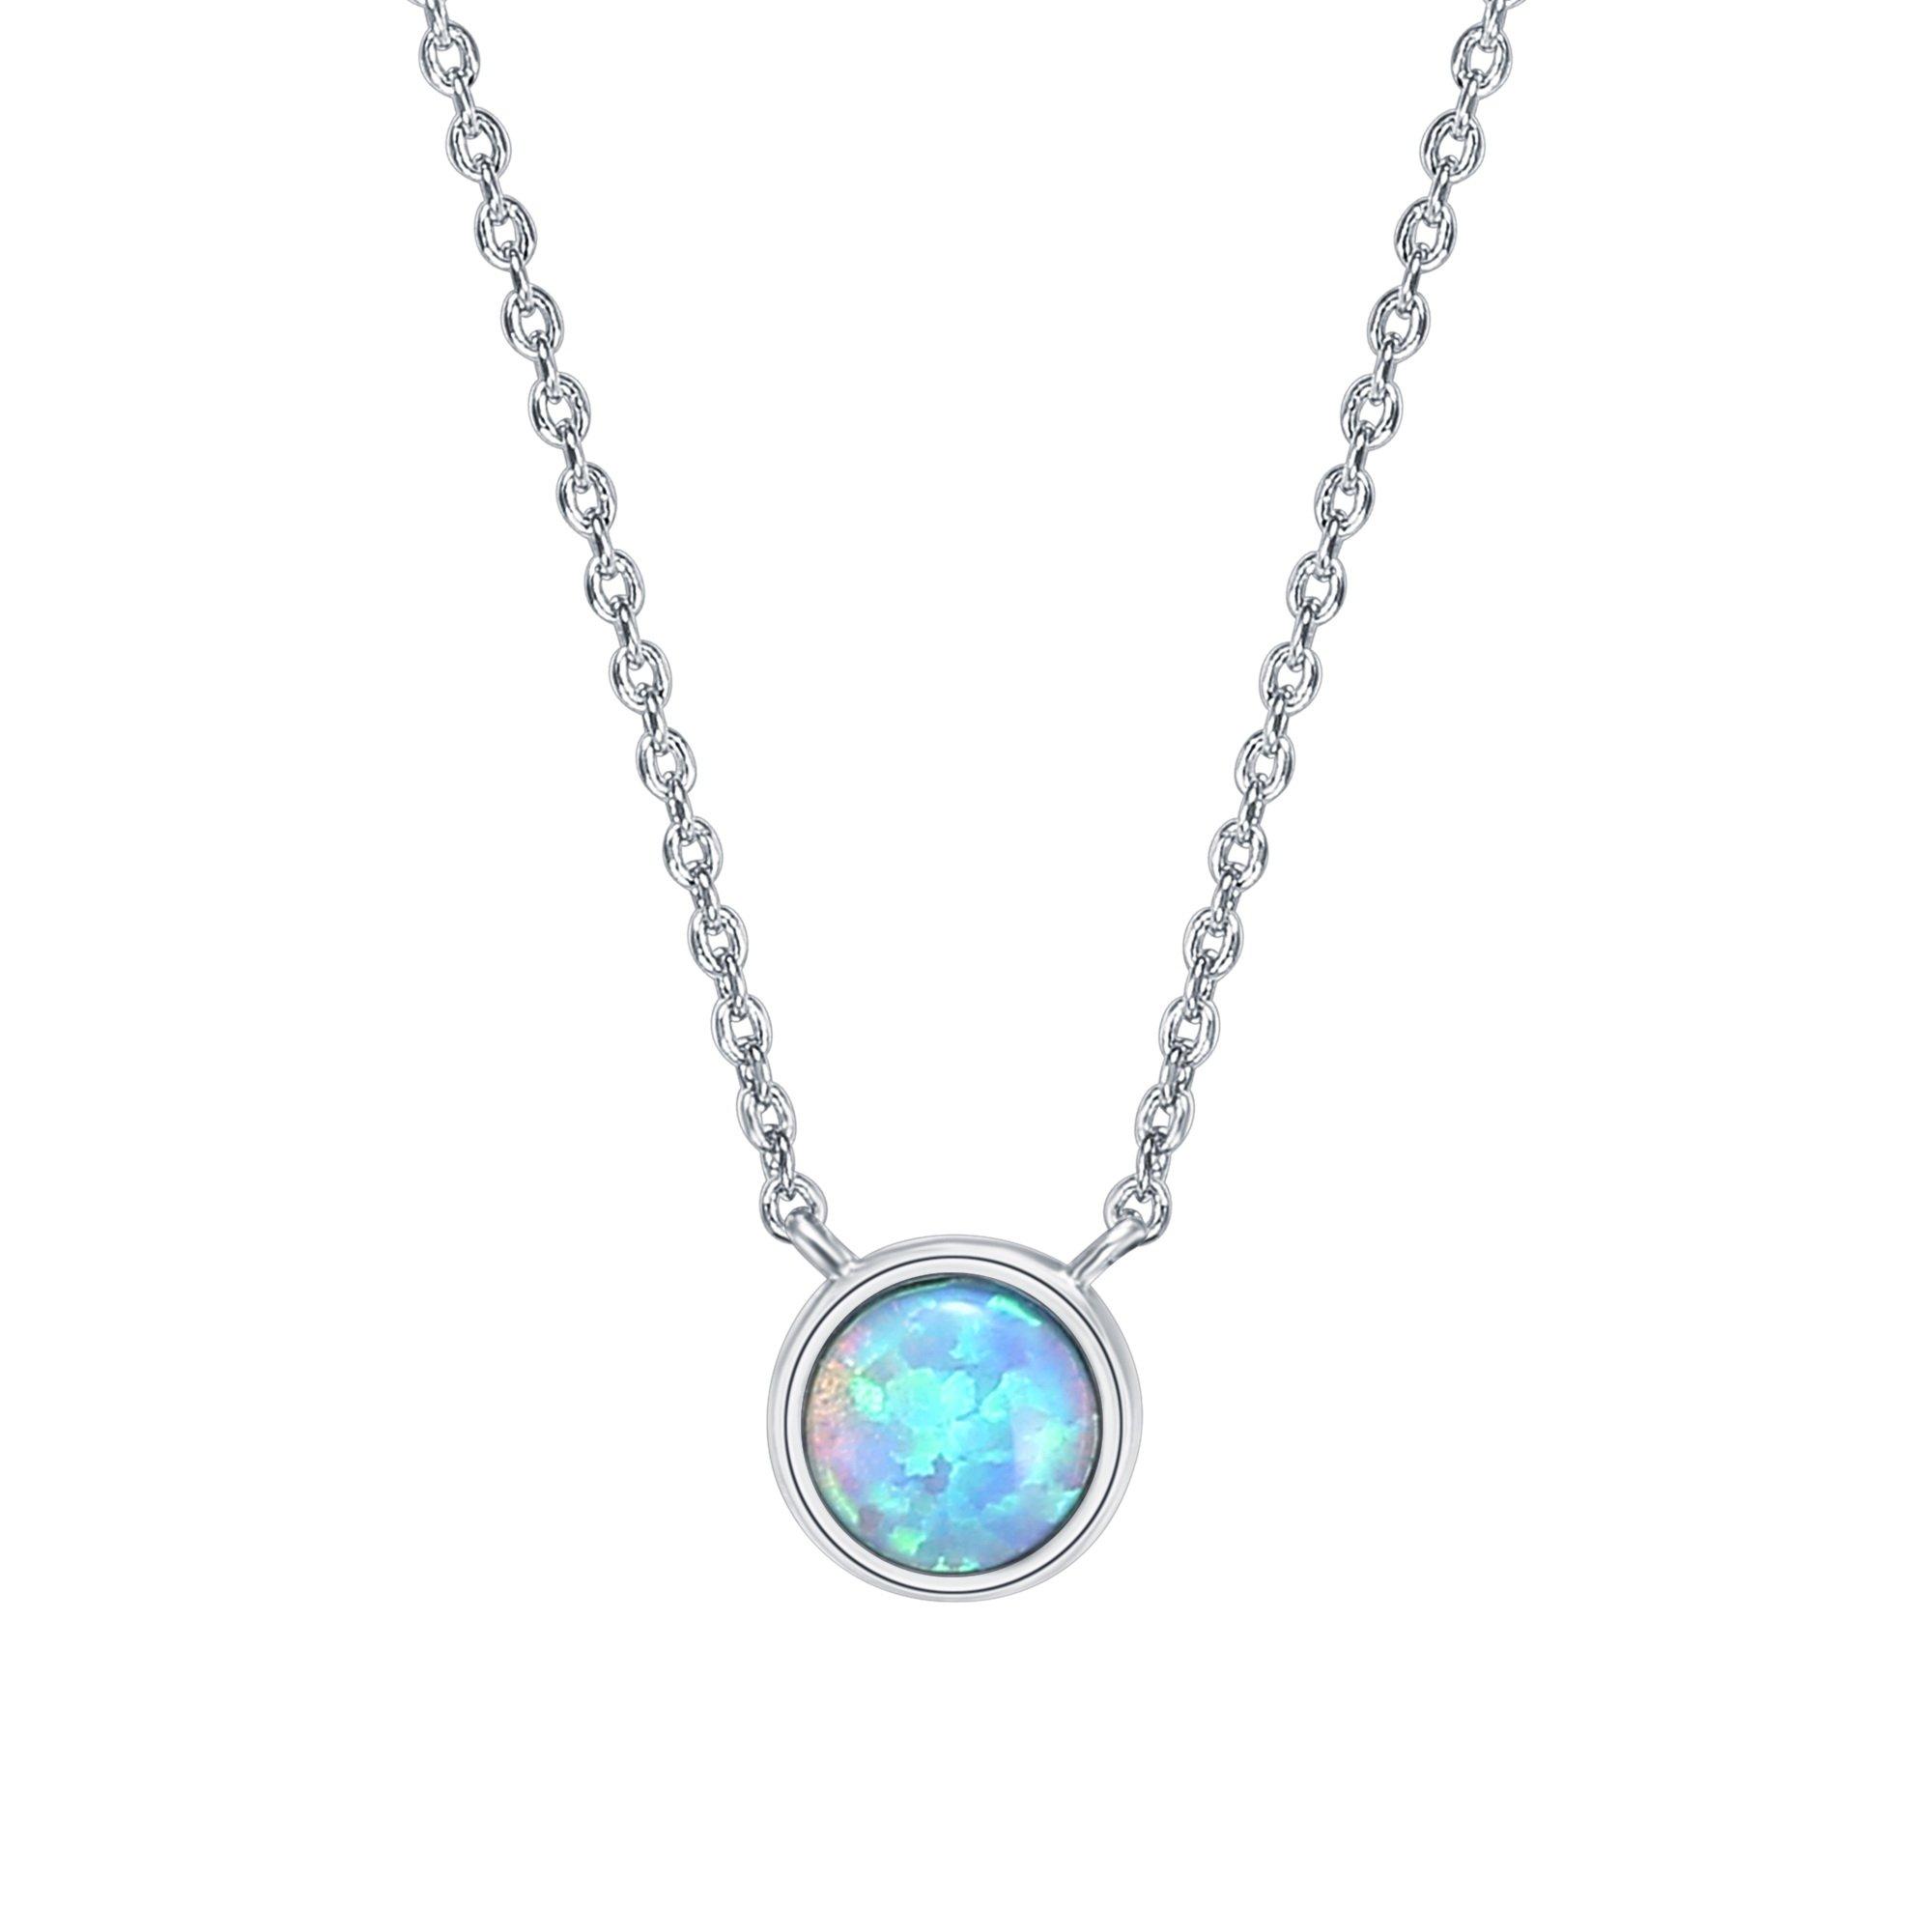 PAVOI 14K Gold Plated Round Bezel Set Blue Opal Necklace 16-18